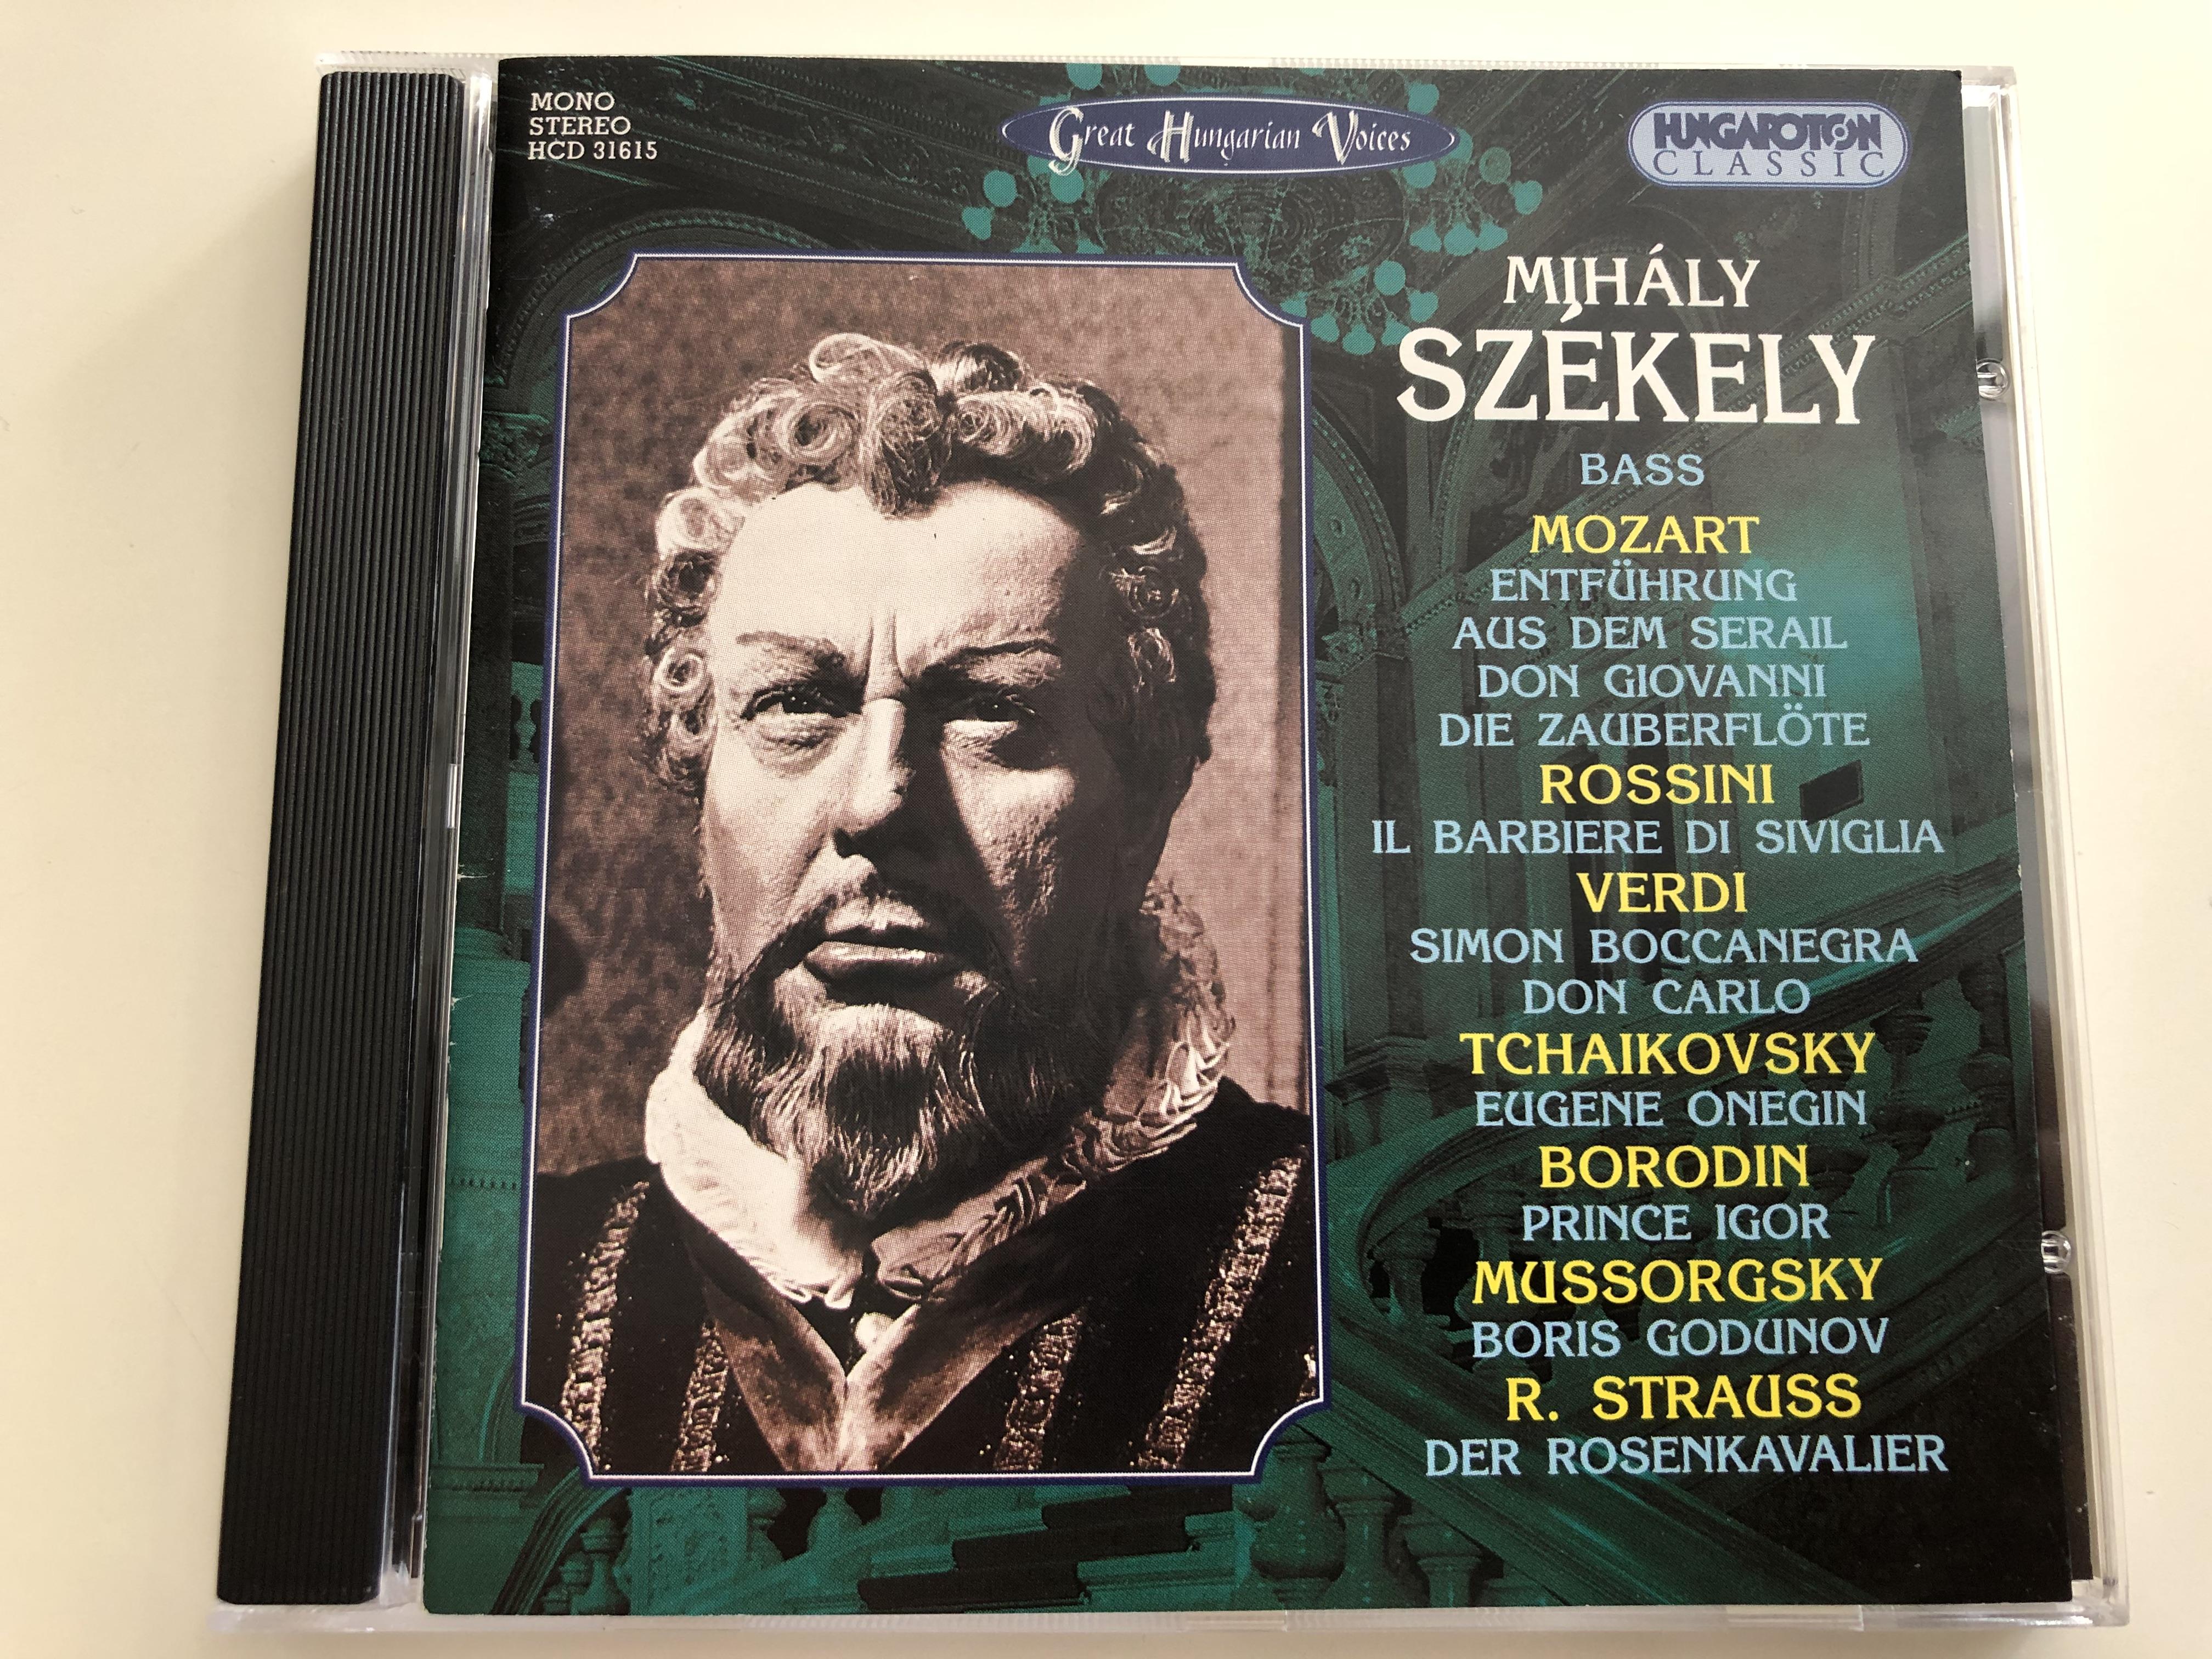 mih-ly-sz-kely-bass-mozart-rossini-verdi-tchaikovsky-borodin-mussorgsky-r.-strauss-great-hungarian-voices-hungaroton-classic-audio-cd-hcd-31615-1-.jpg